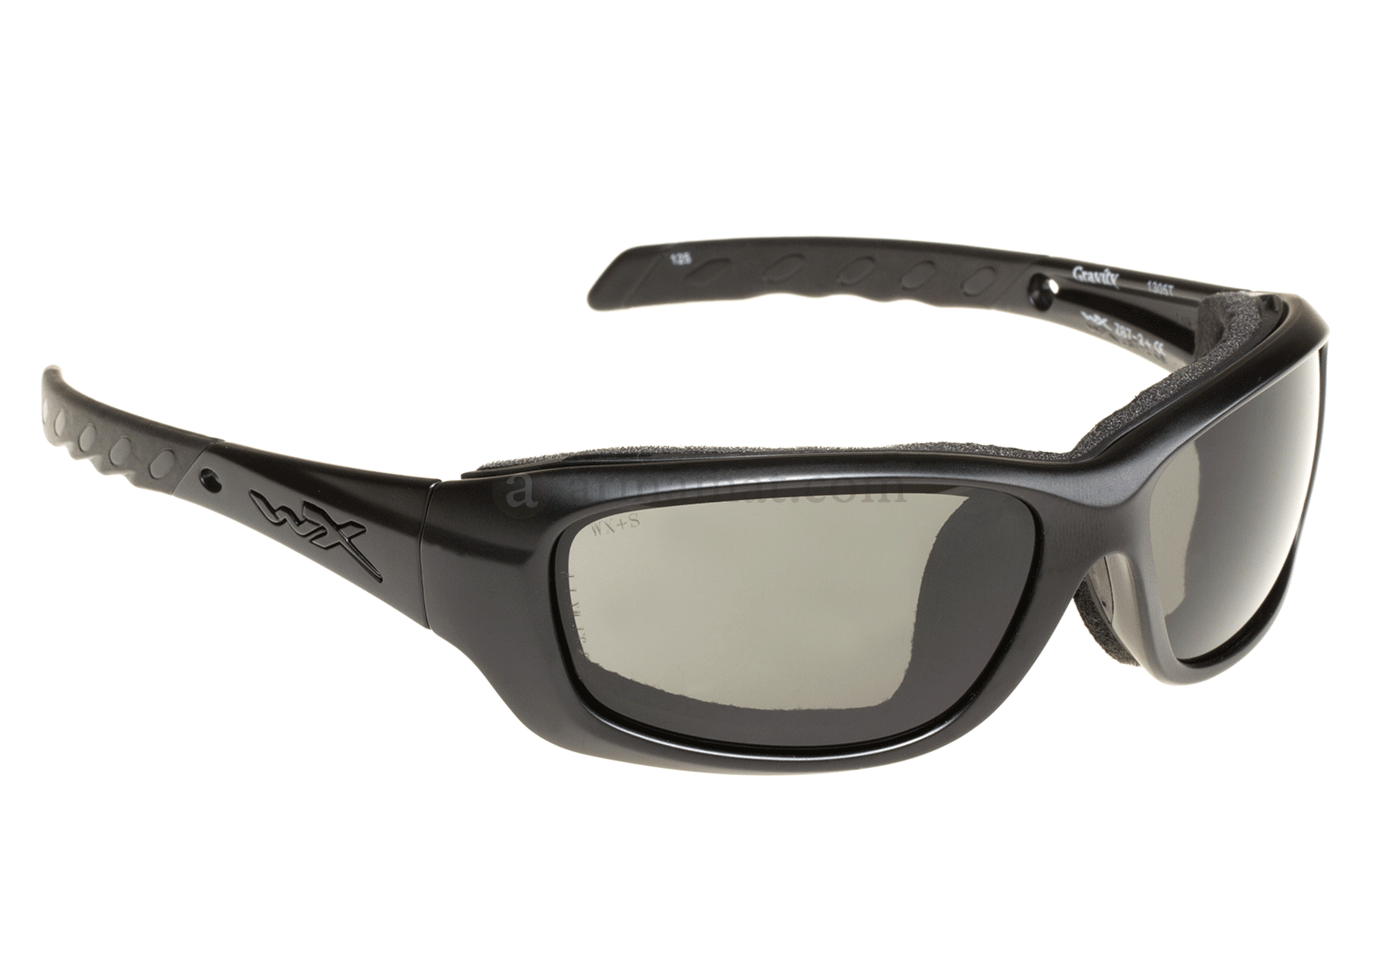 9014aeeb63b1 Black Ops WX Gravity Black (Wiley X) - Glasses - Eyewear ...